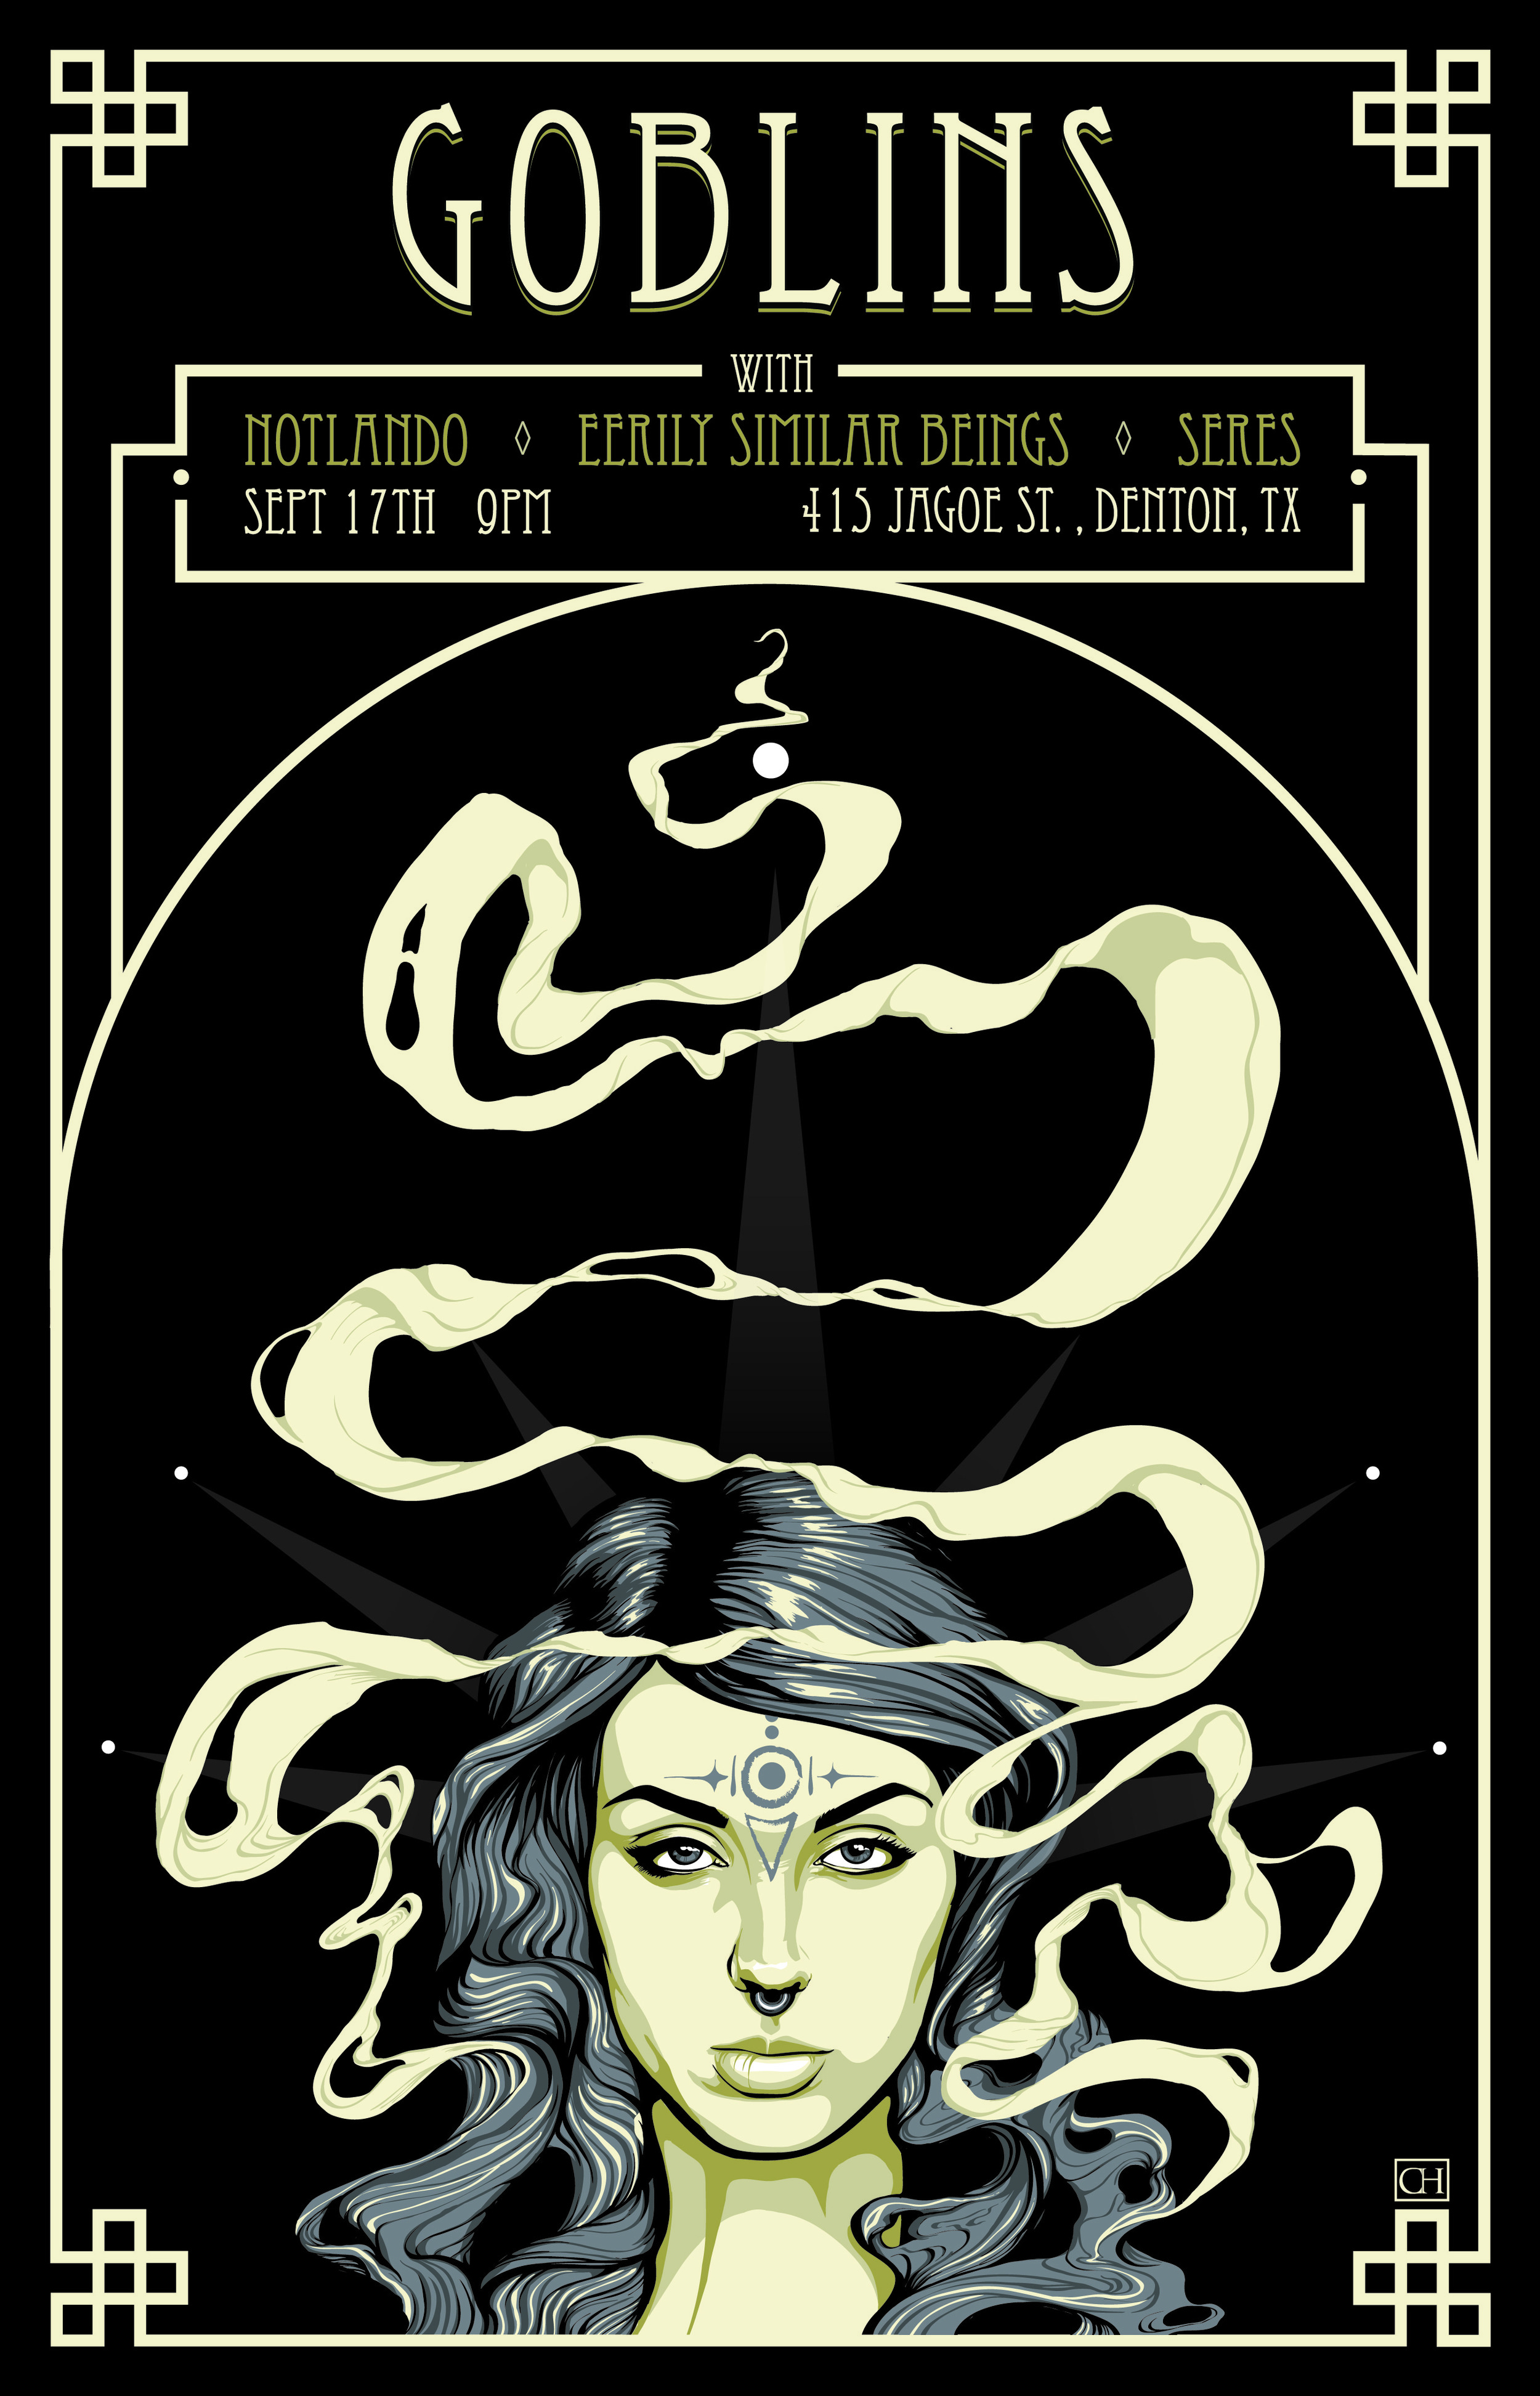 Goblins-NotLando Poster-01.jpg